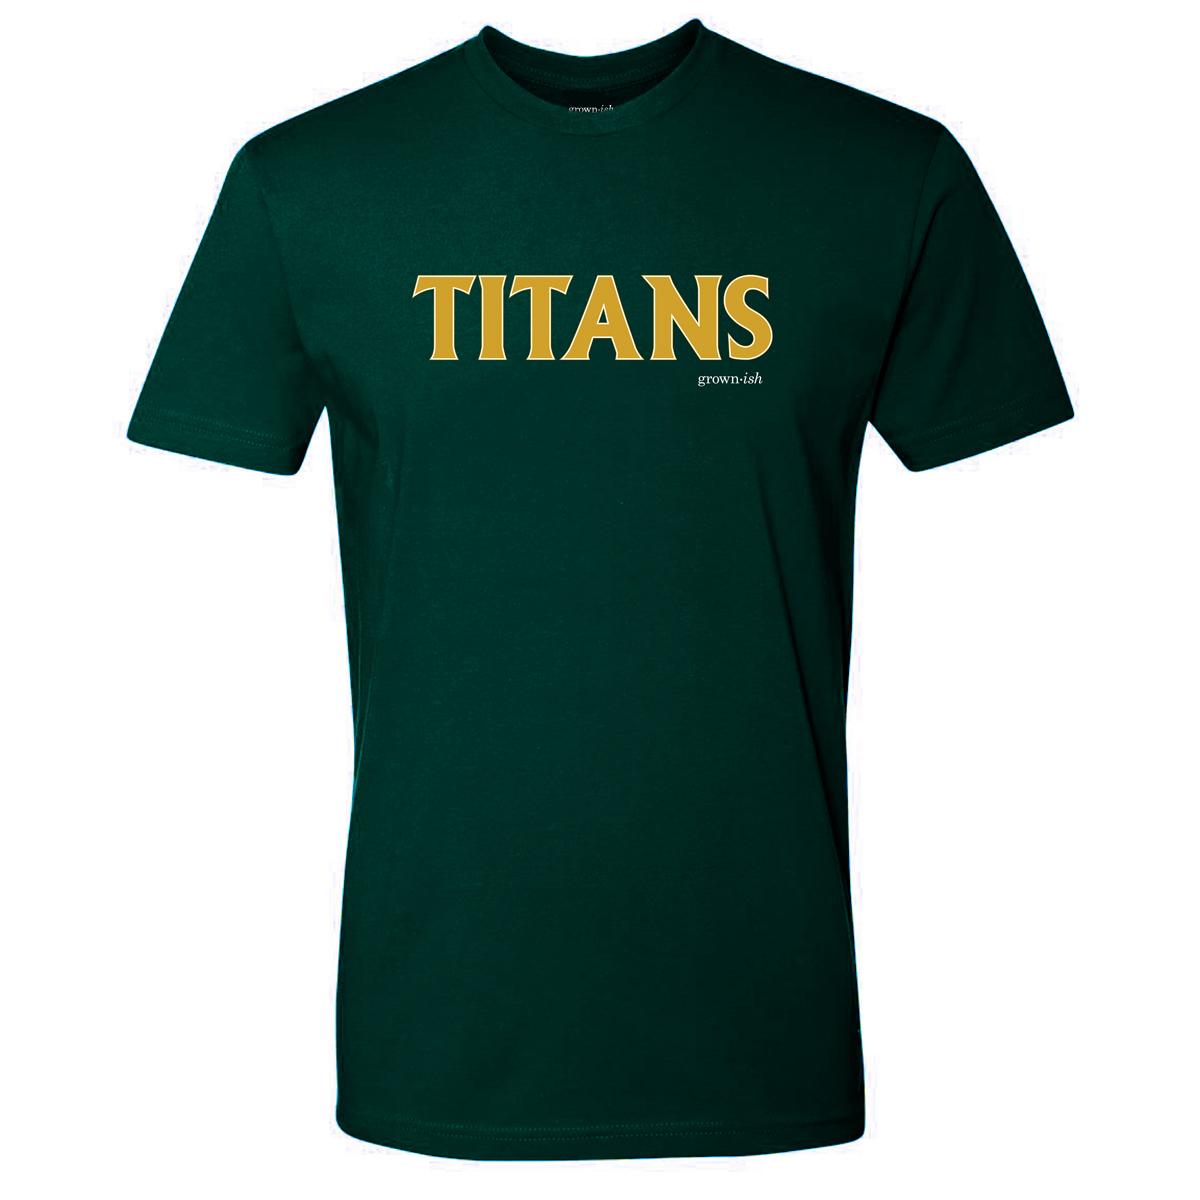 Grown-ish Titans T-Shirt